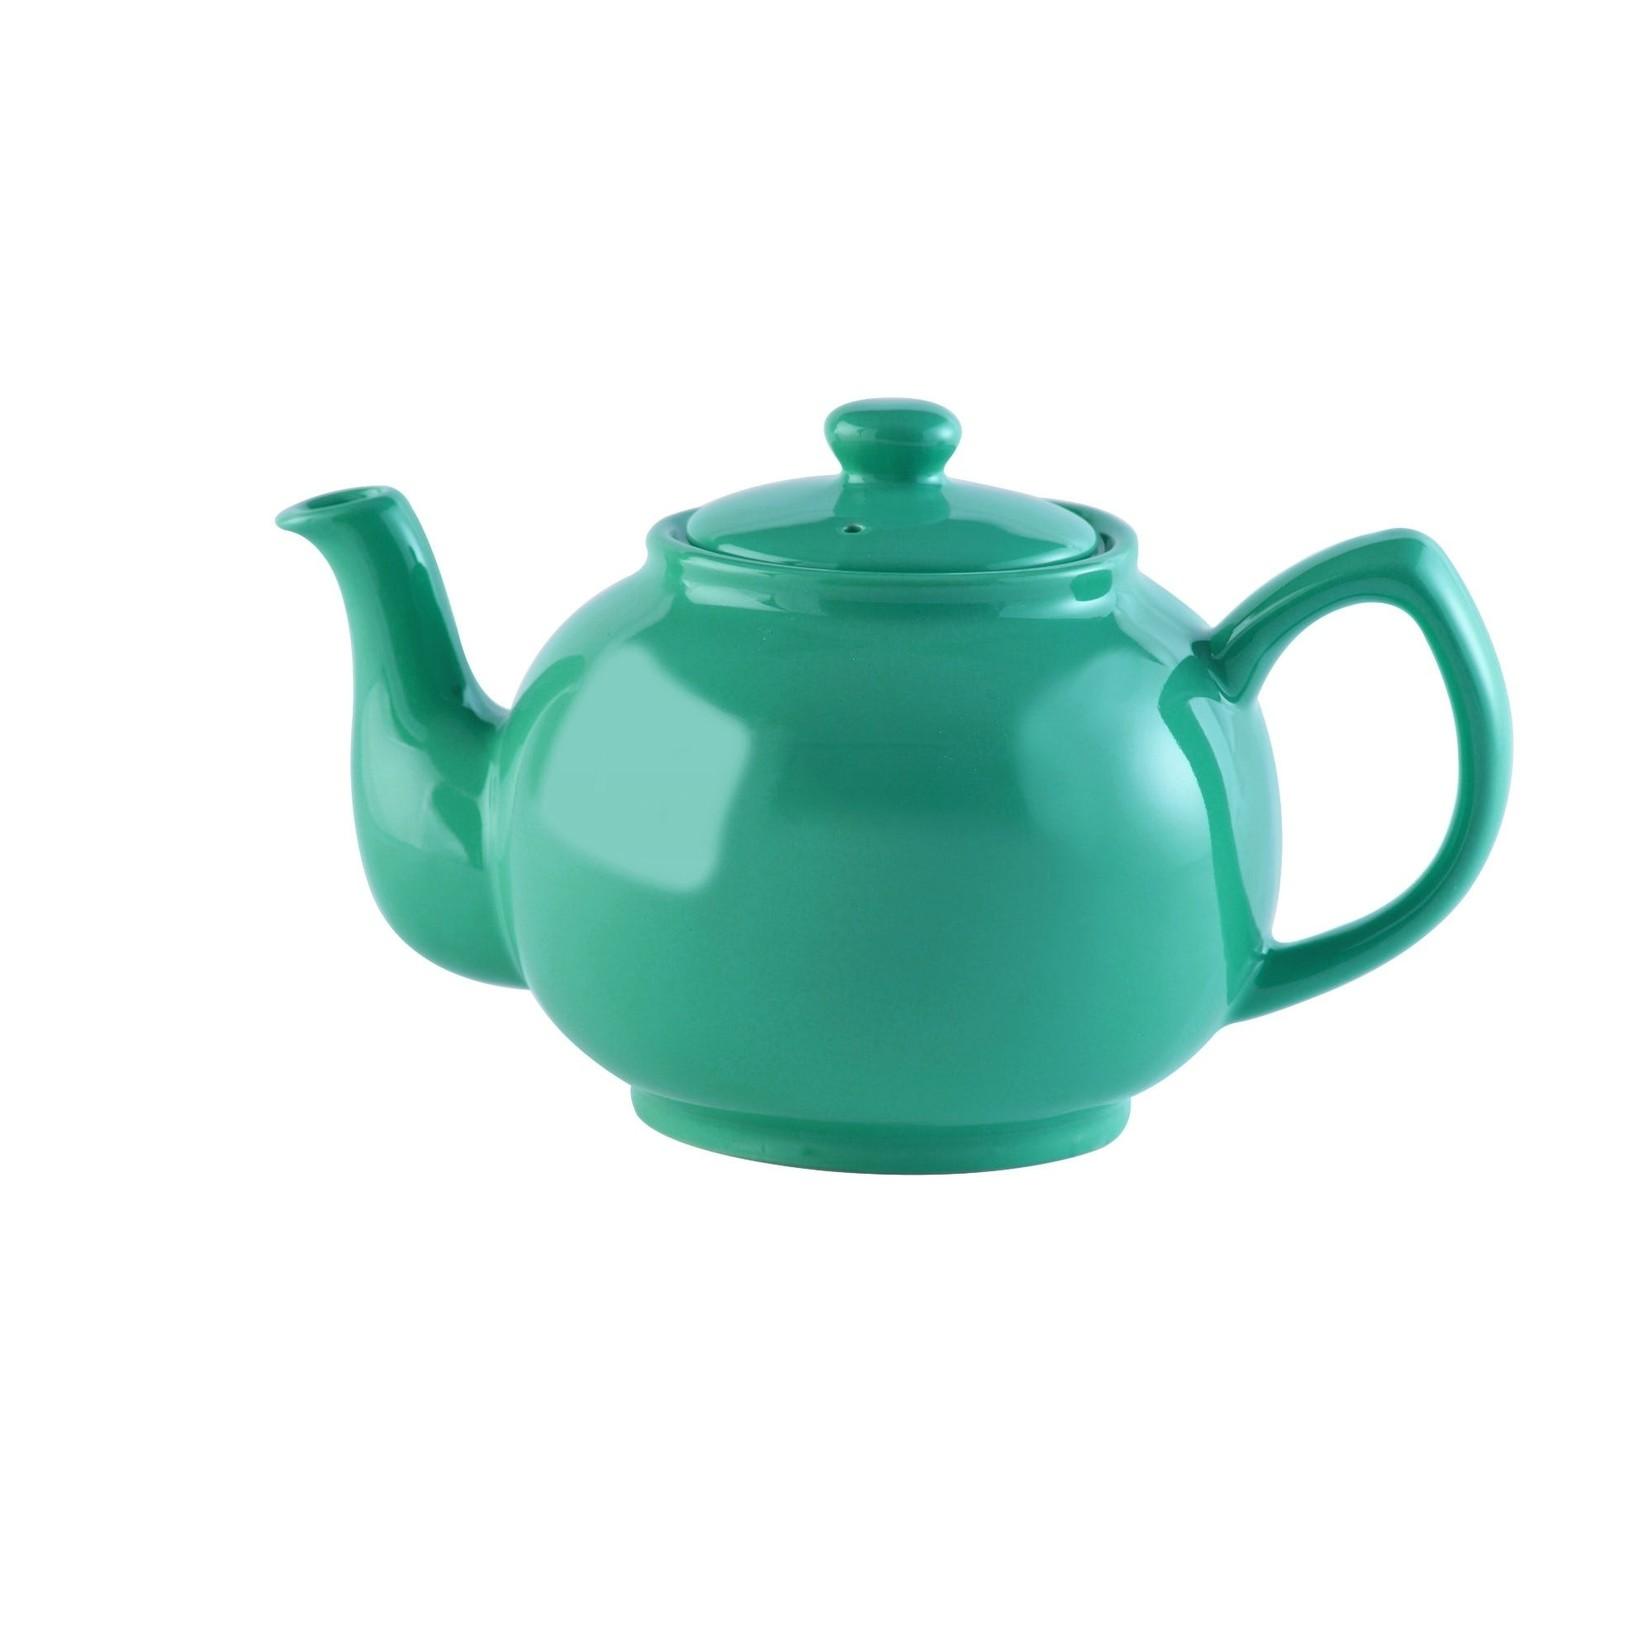 Price & Kensington Bright Teapot